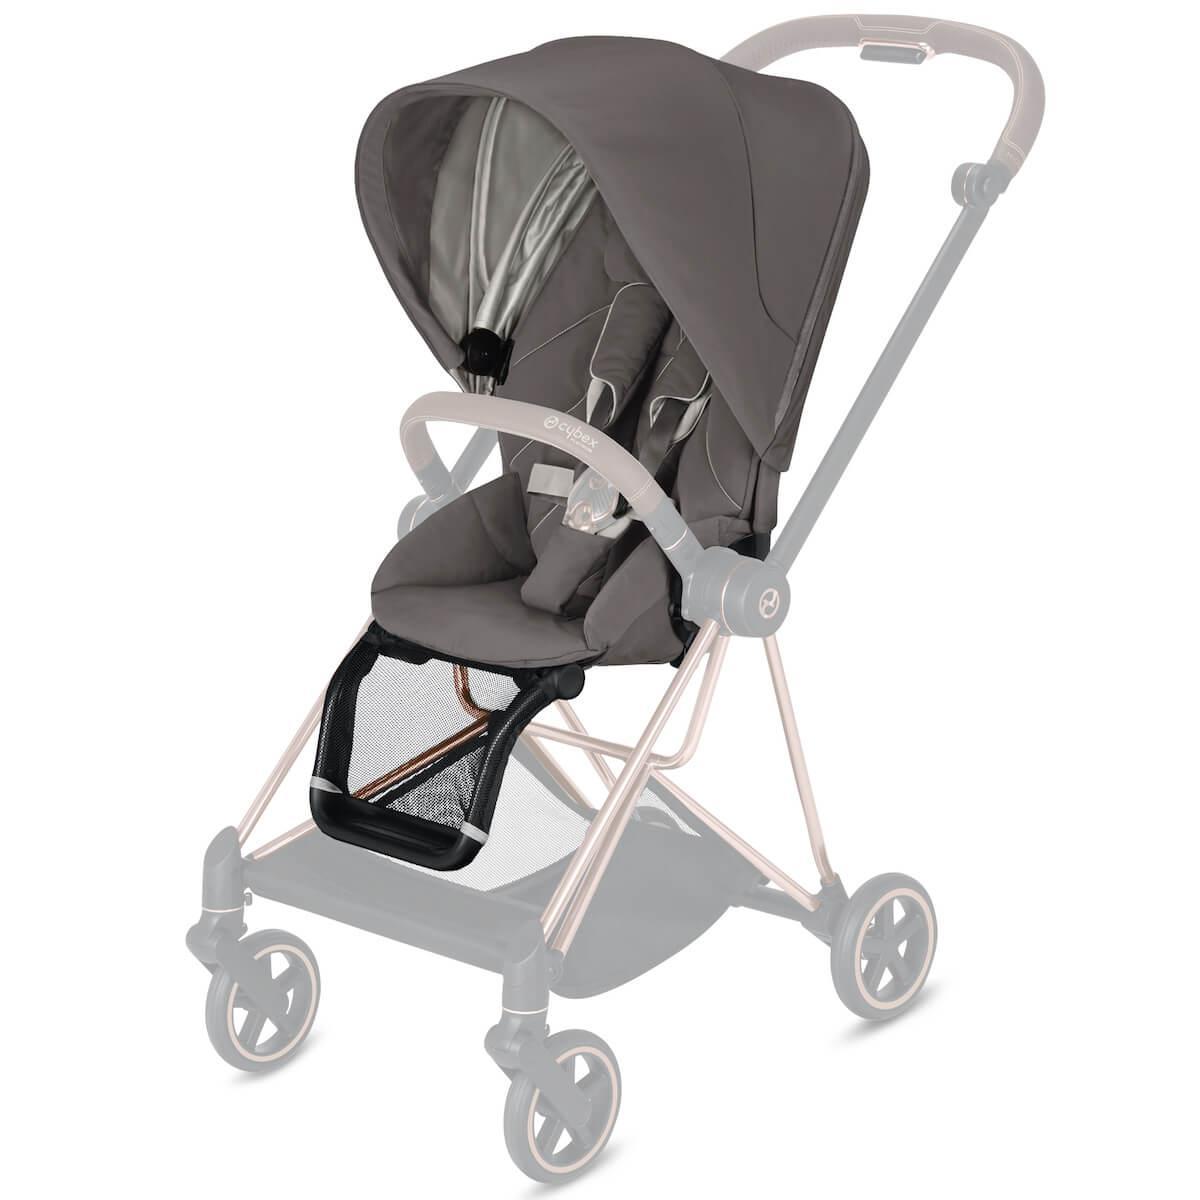 Asiento-pack silla MIOS Cybex Soho grey-mid grey